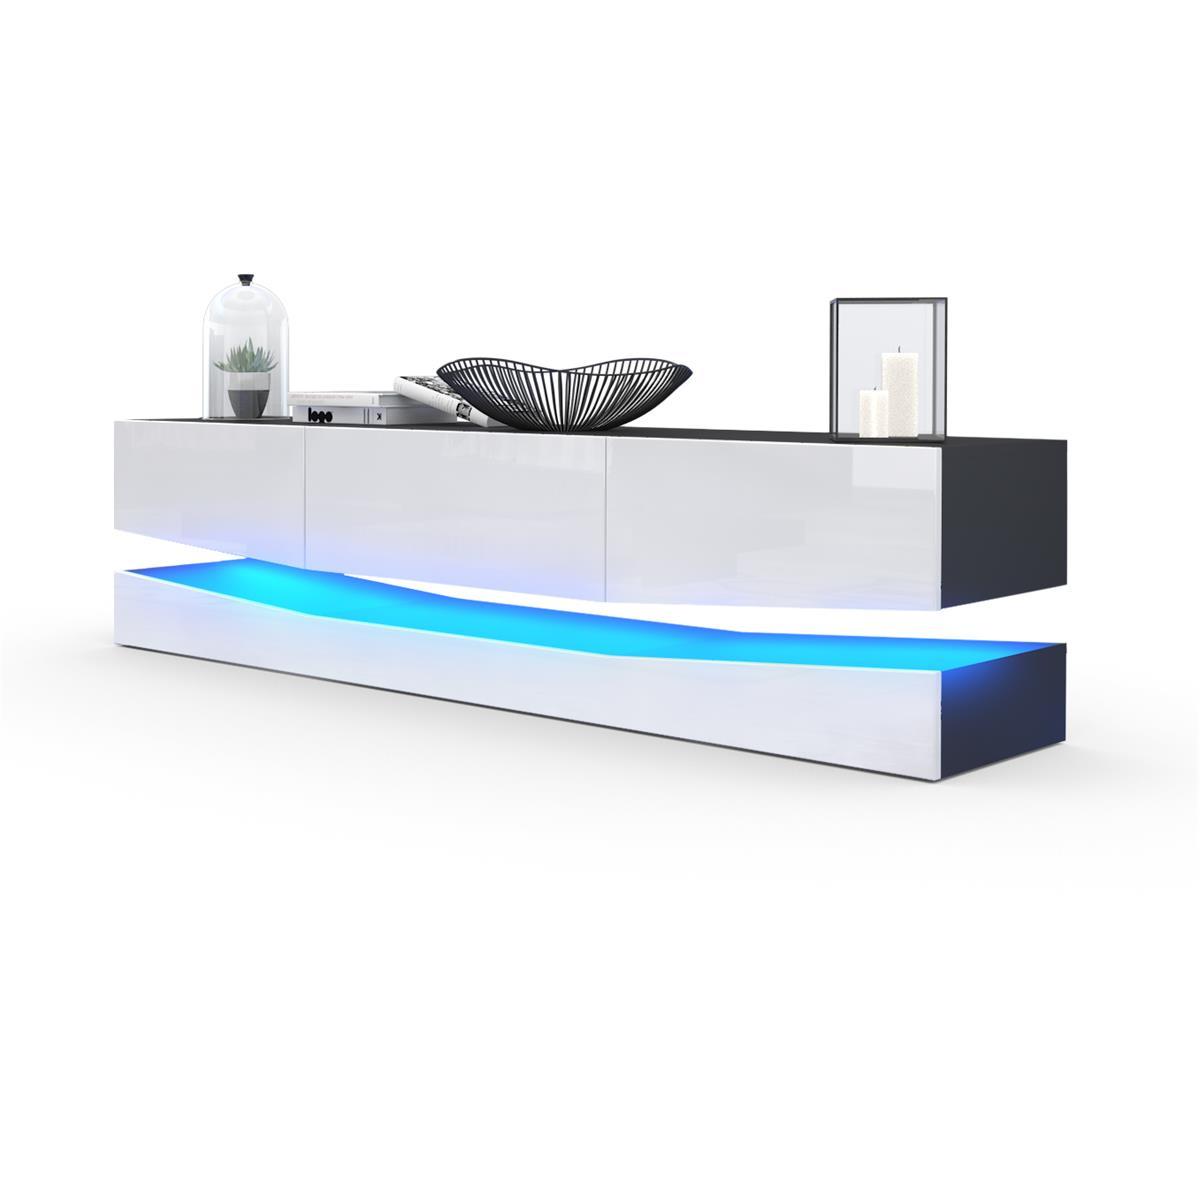 Lowboard led  Stellt die Ausführung mit LED Beleuchtung dar